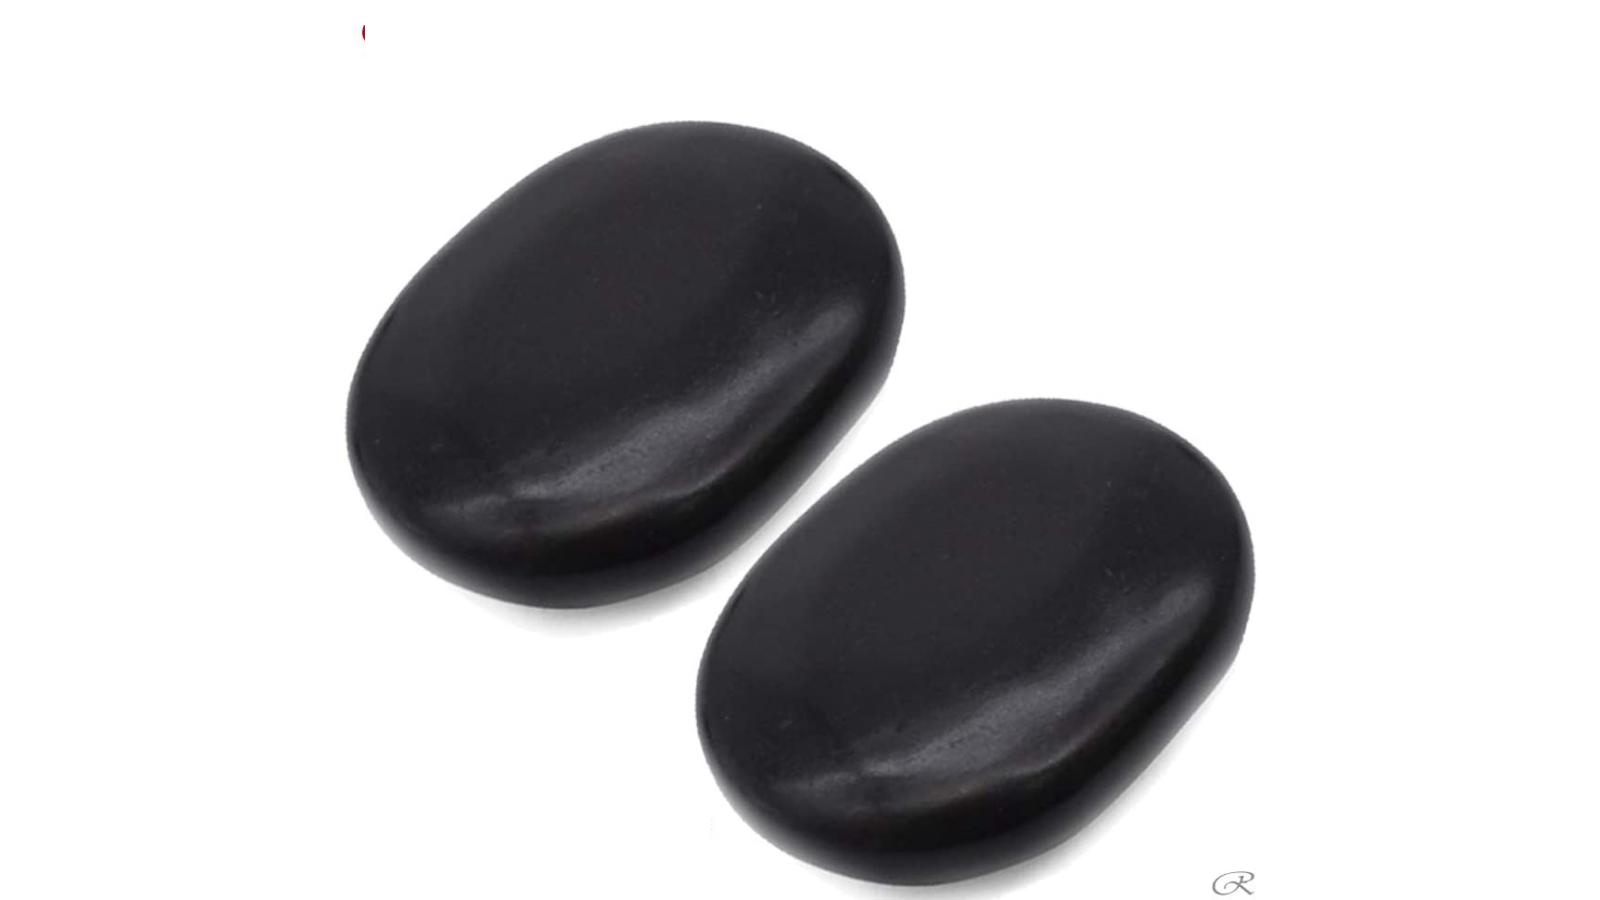 Two large, black massage stones